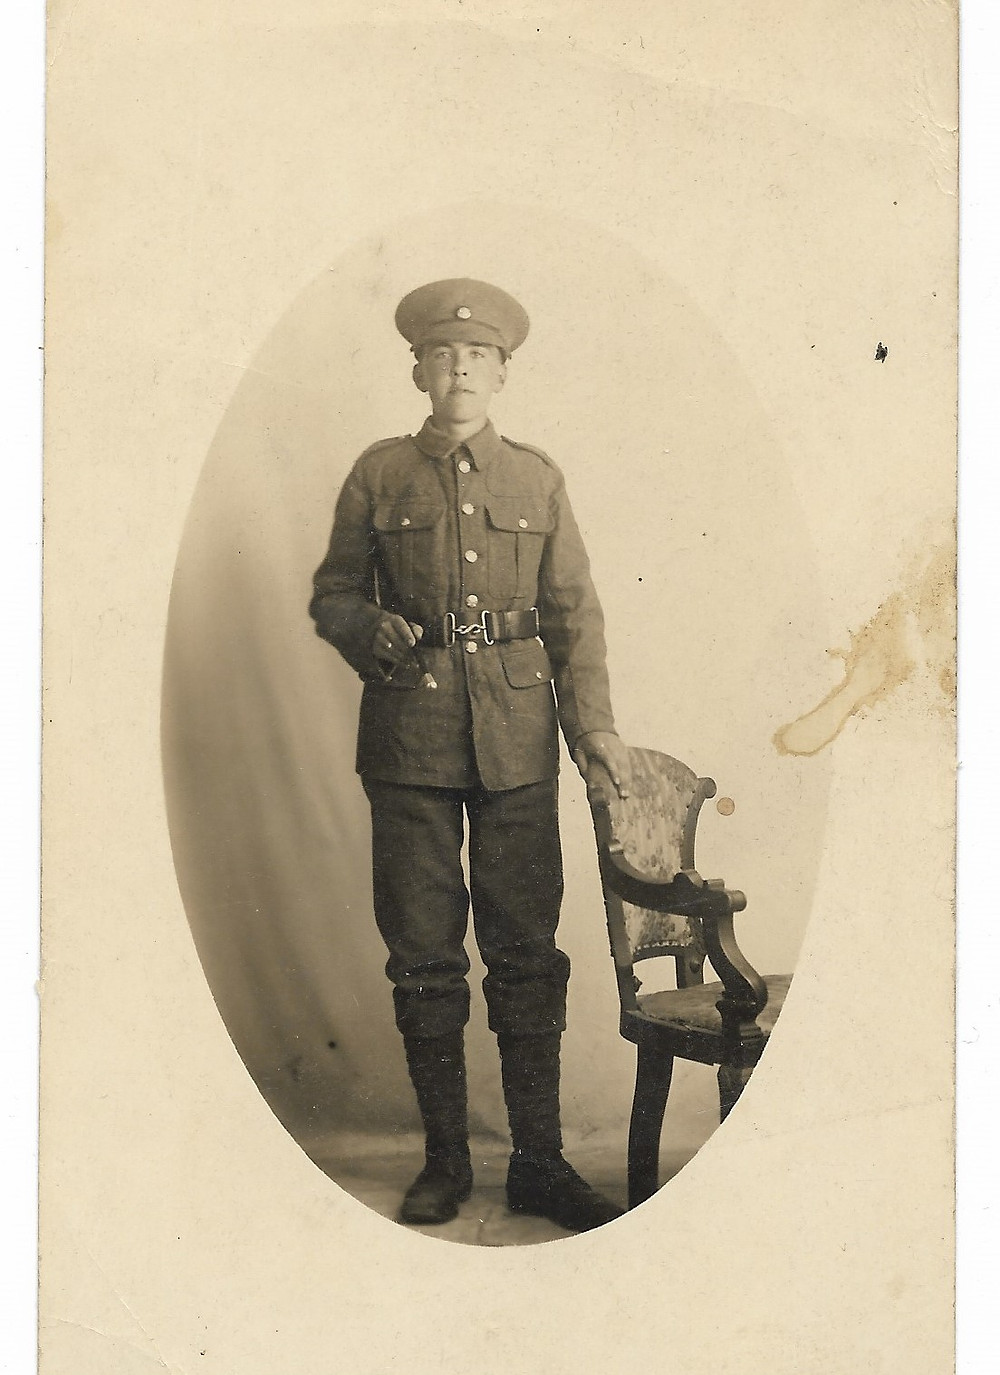 Sam Clark in WW1 uniform.